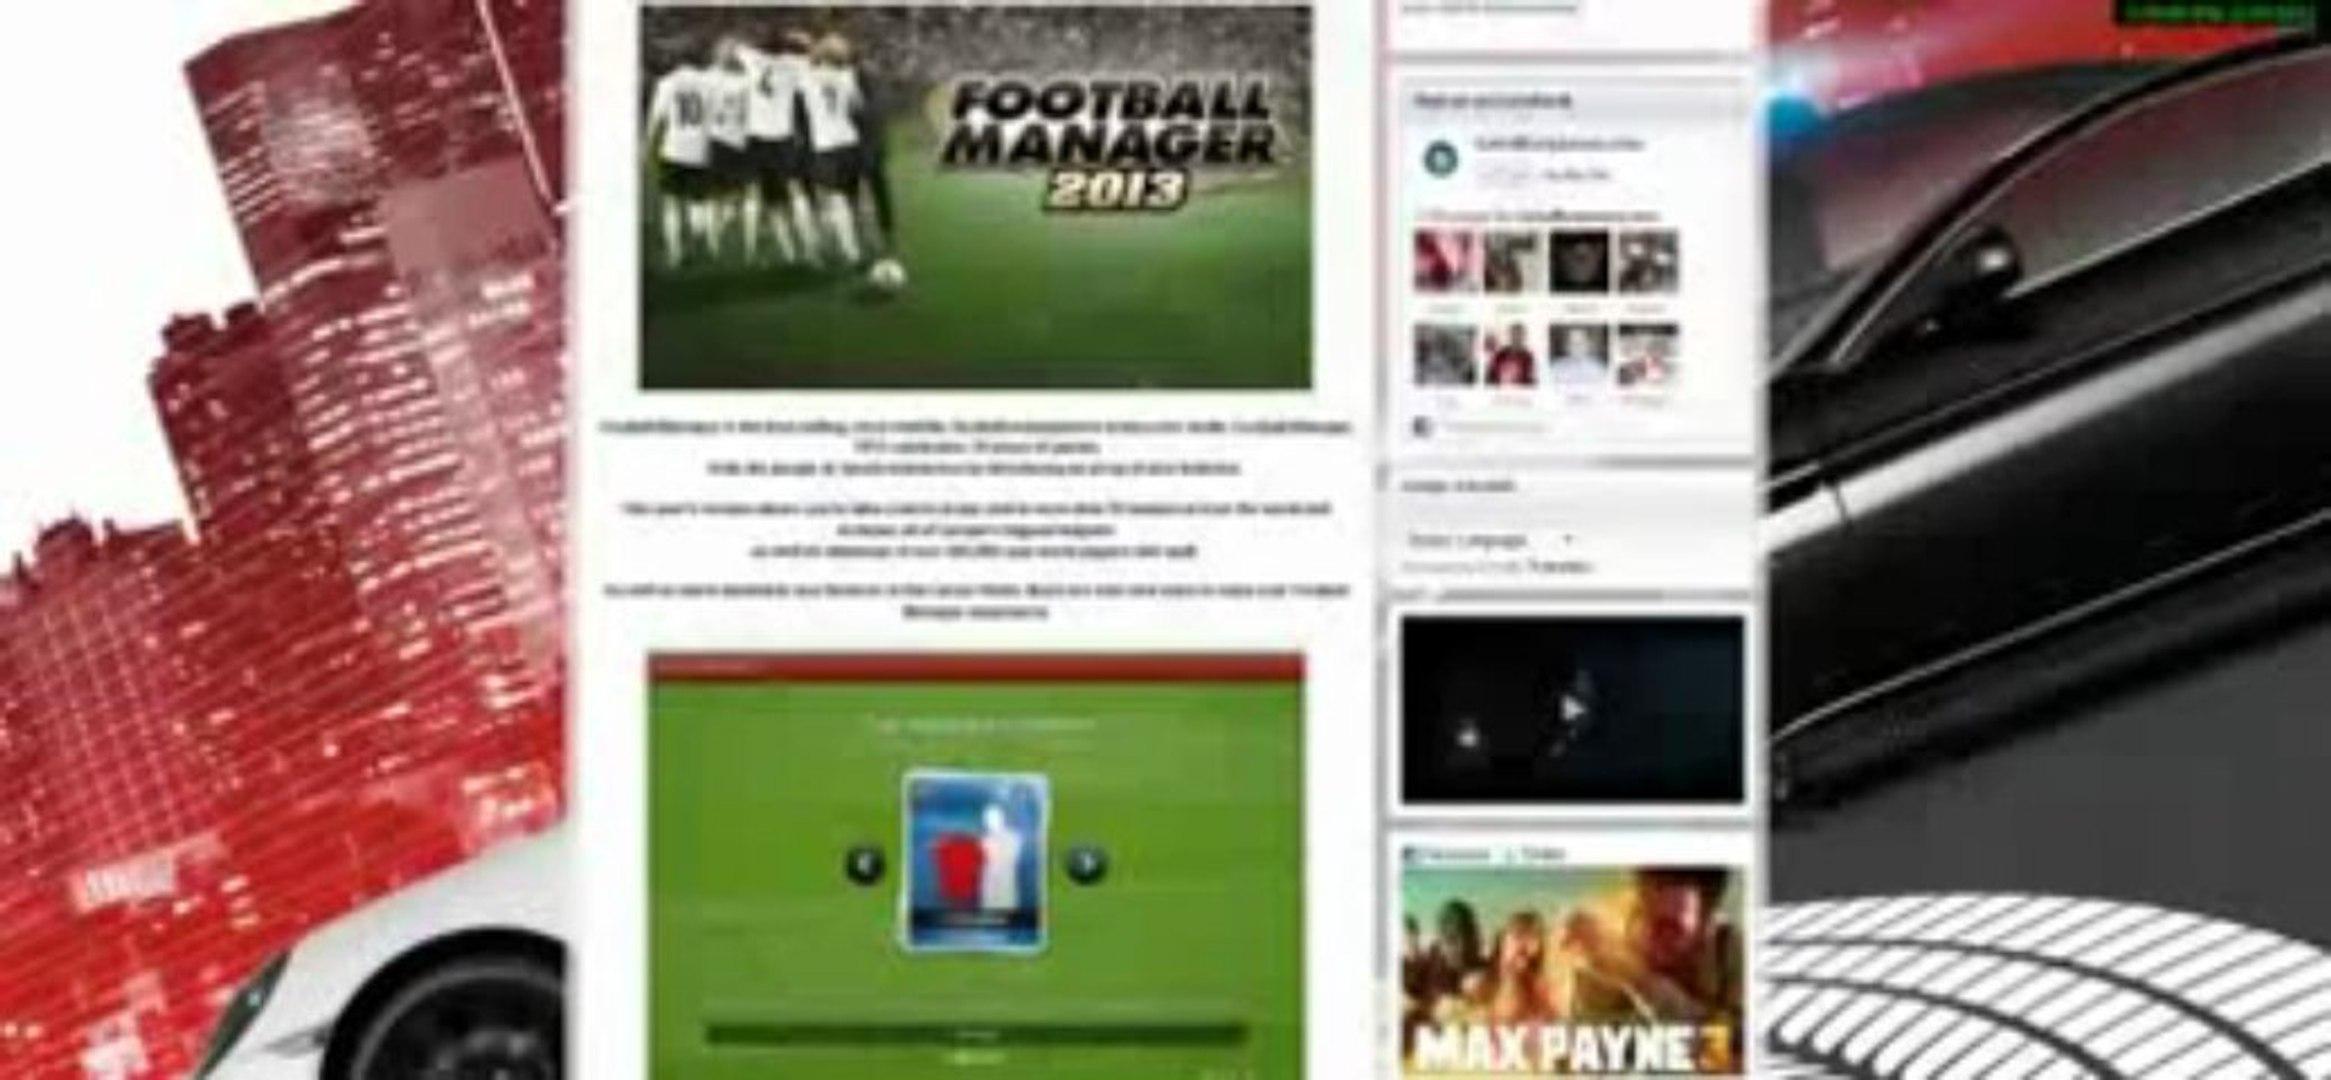 Football manager 2013 FM 2013 cd key generator + STEAM 2013